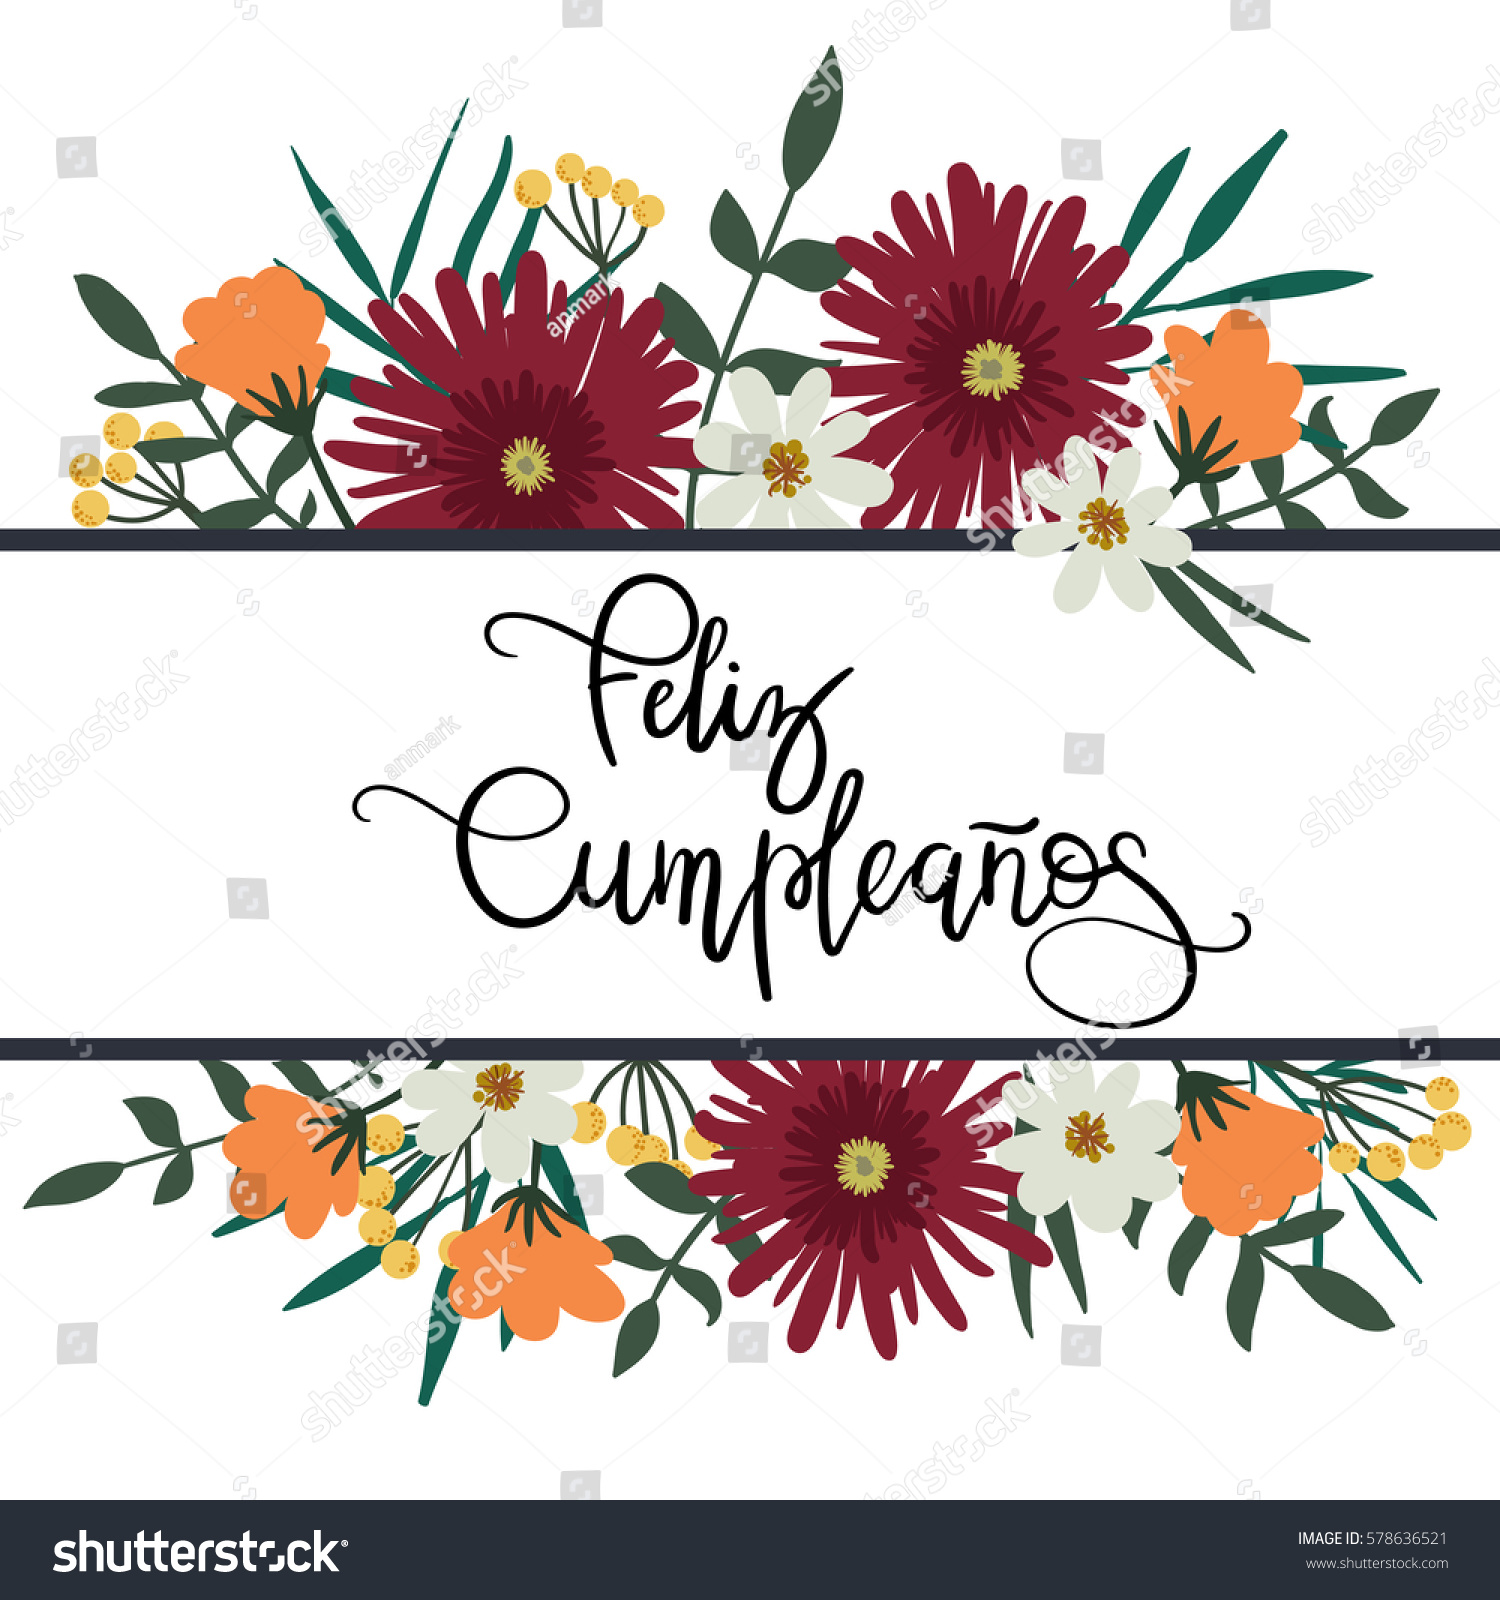 Feliz Cumpleanos Happy Birthday Spanish Hand Stock Vector 578636521